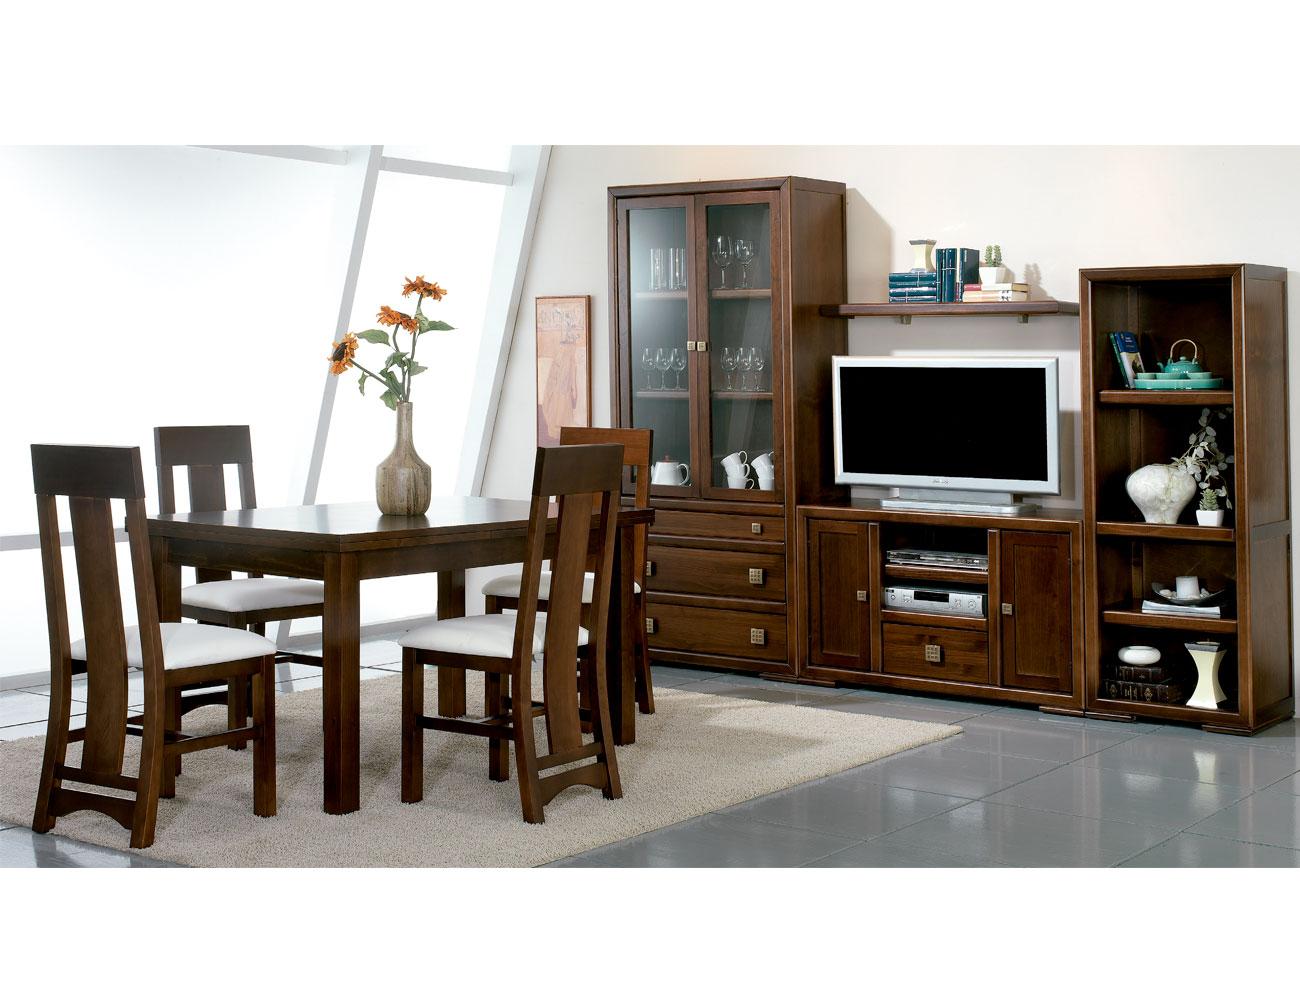 Composicion12 mueble salon comedor mesa silla6